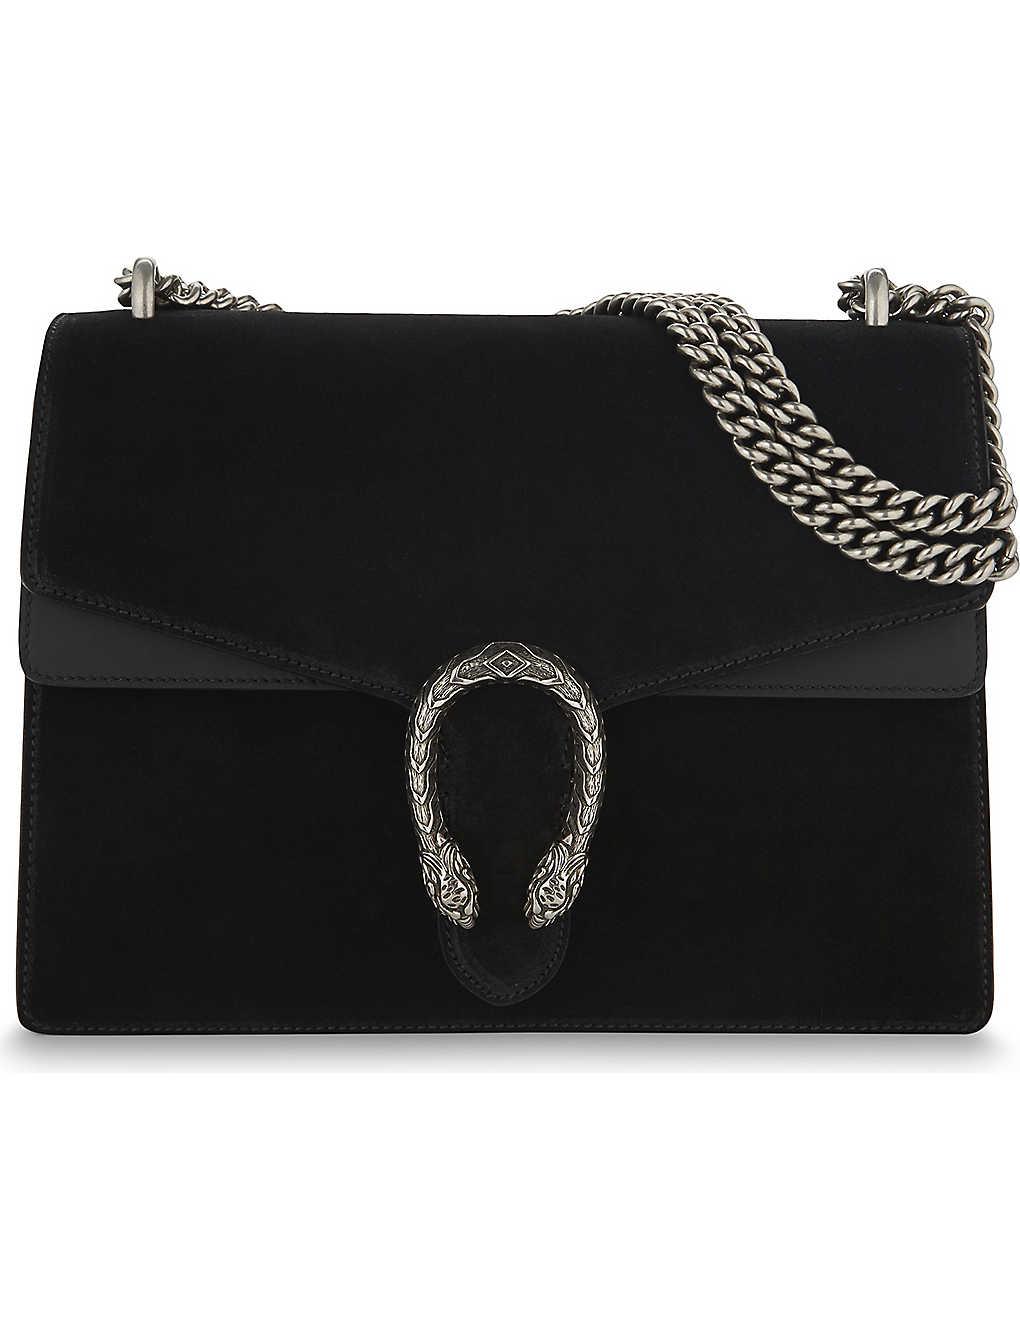 e3f569247e2b GUCCI - Dionysus medium suede shoulder bag